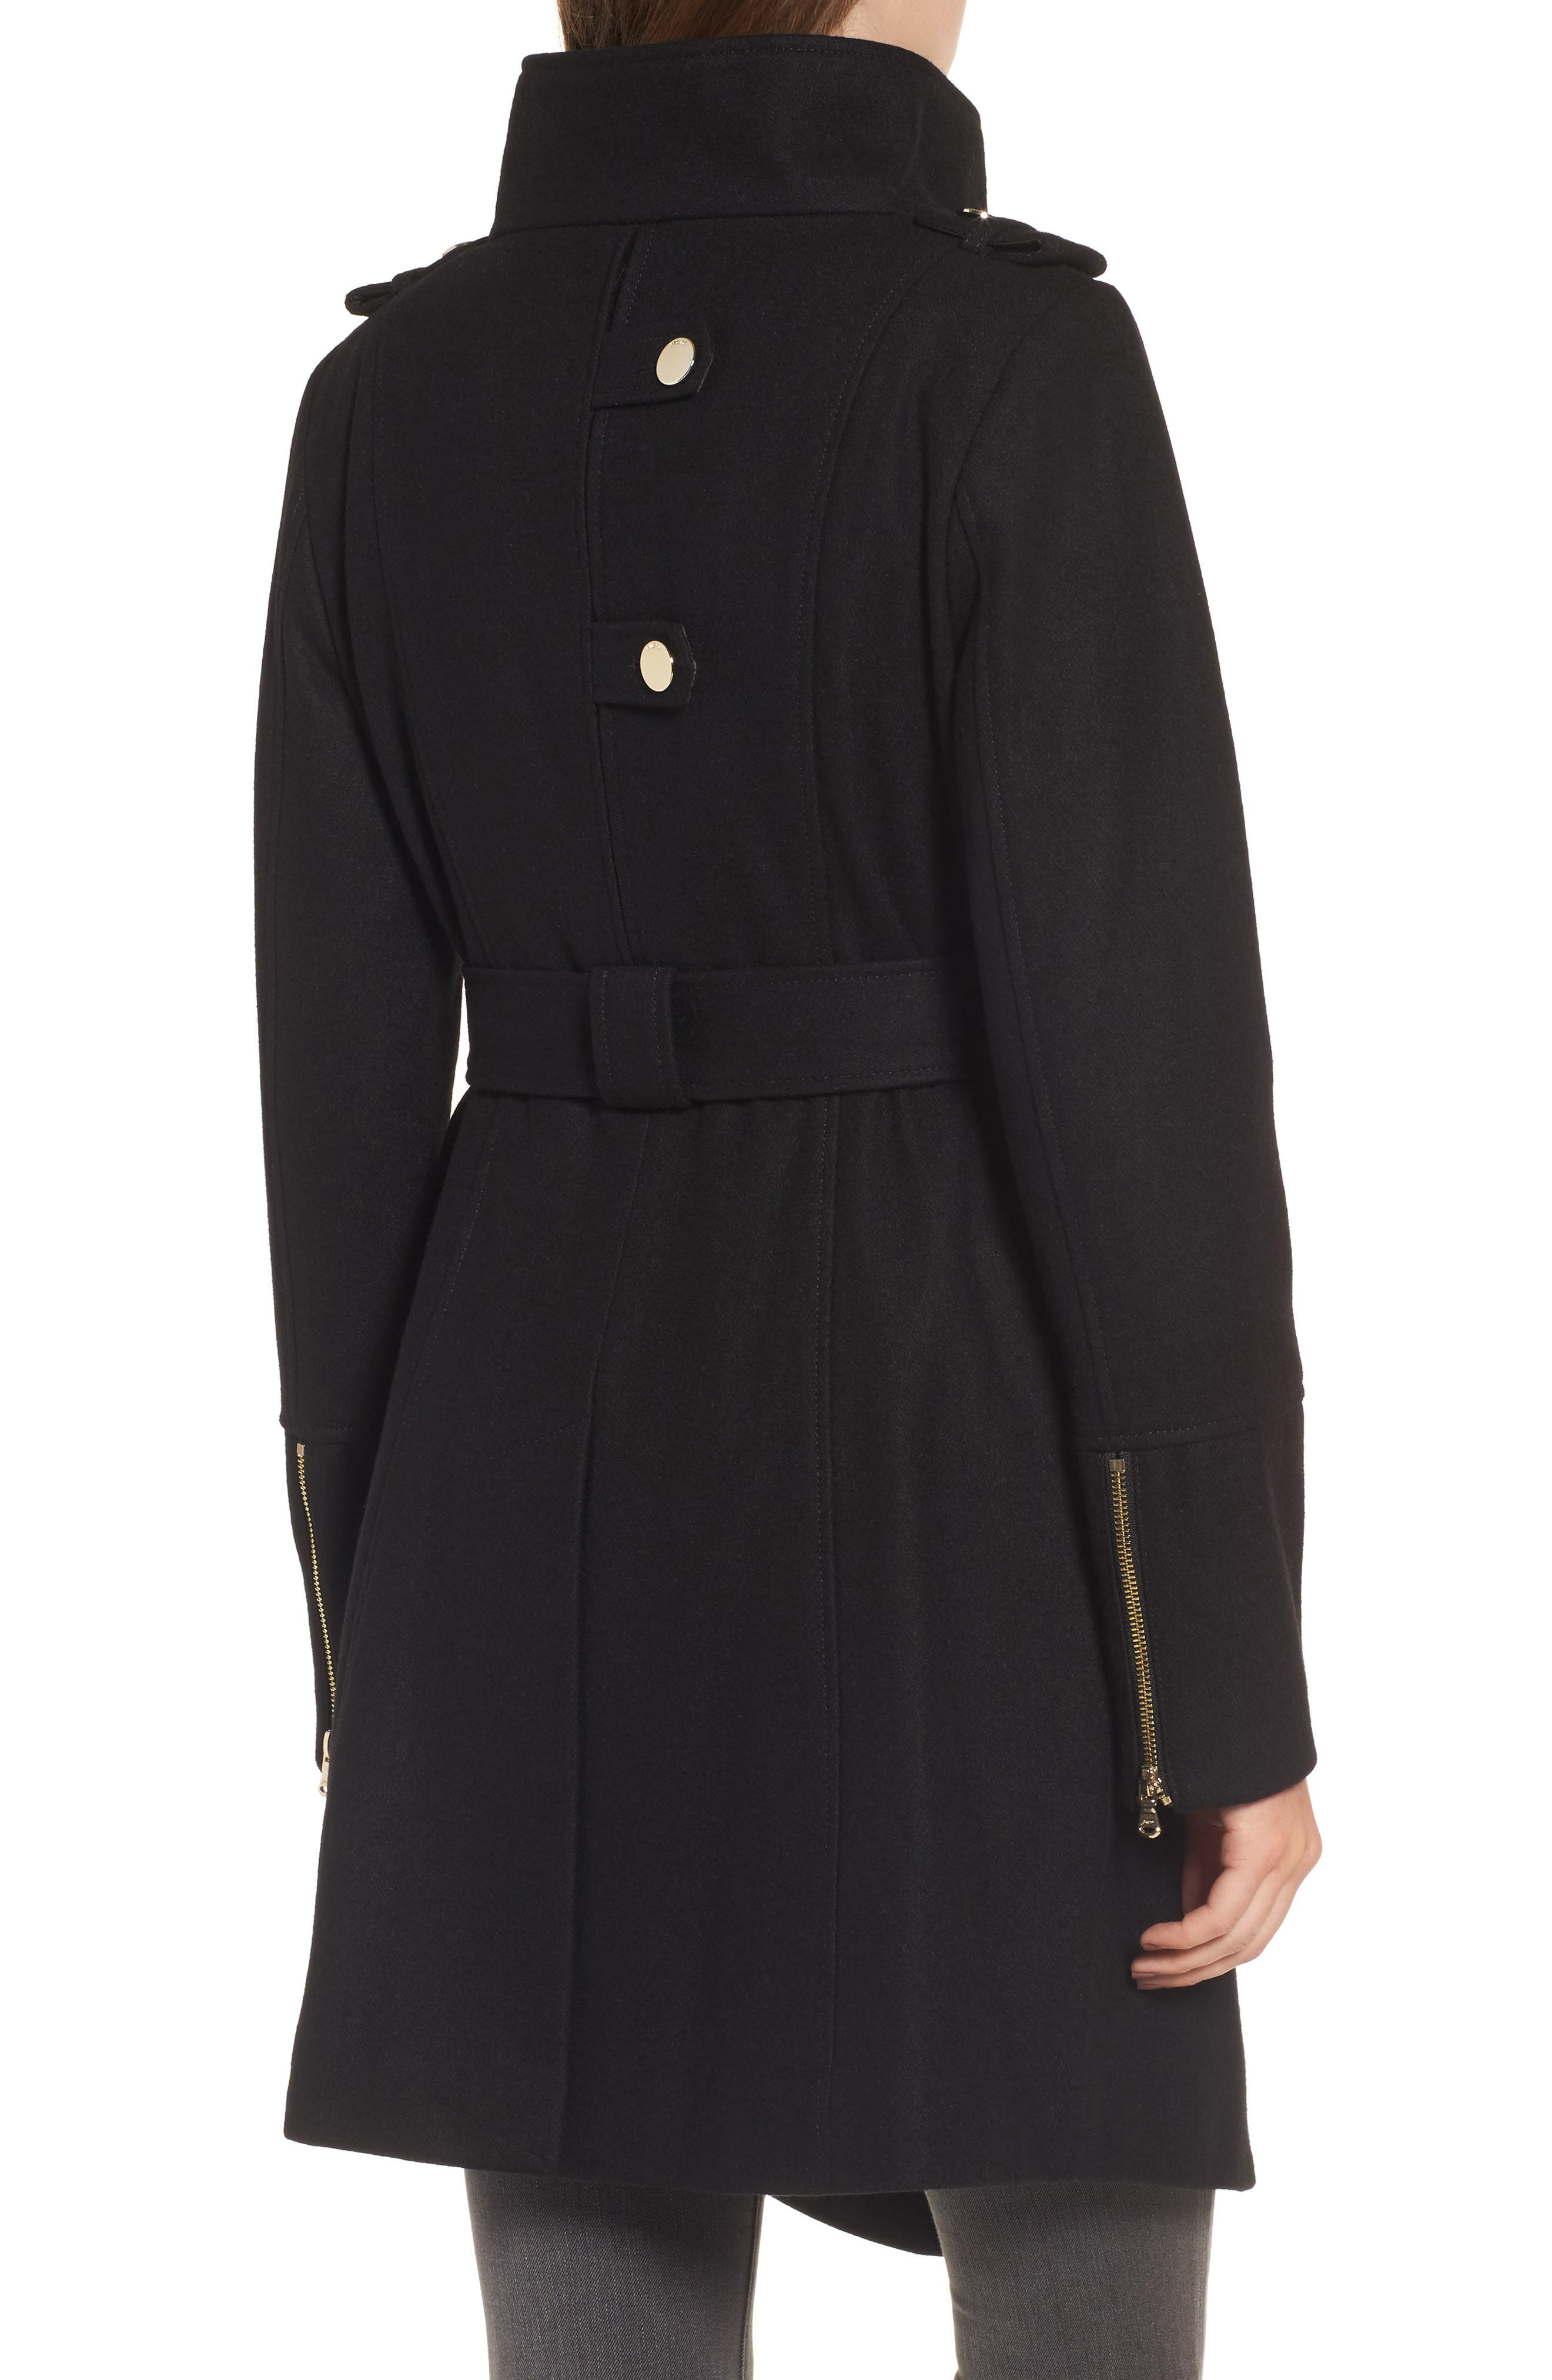 Wrap Trench Coat,                             Alternate thumbnail 2, color,                             Black